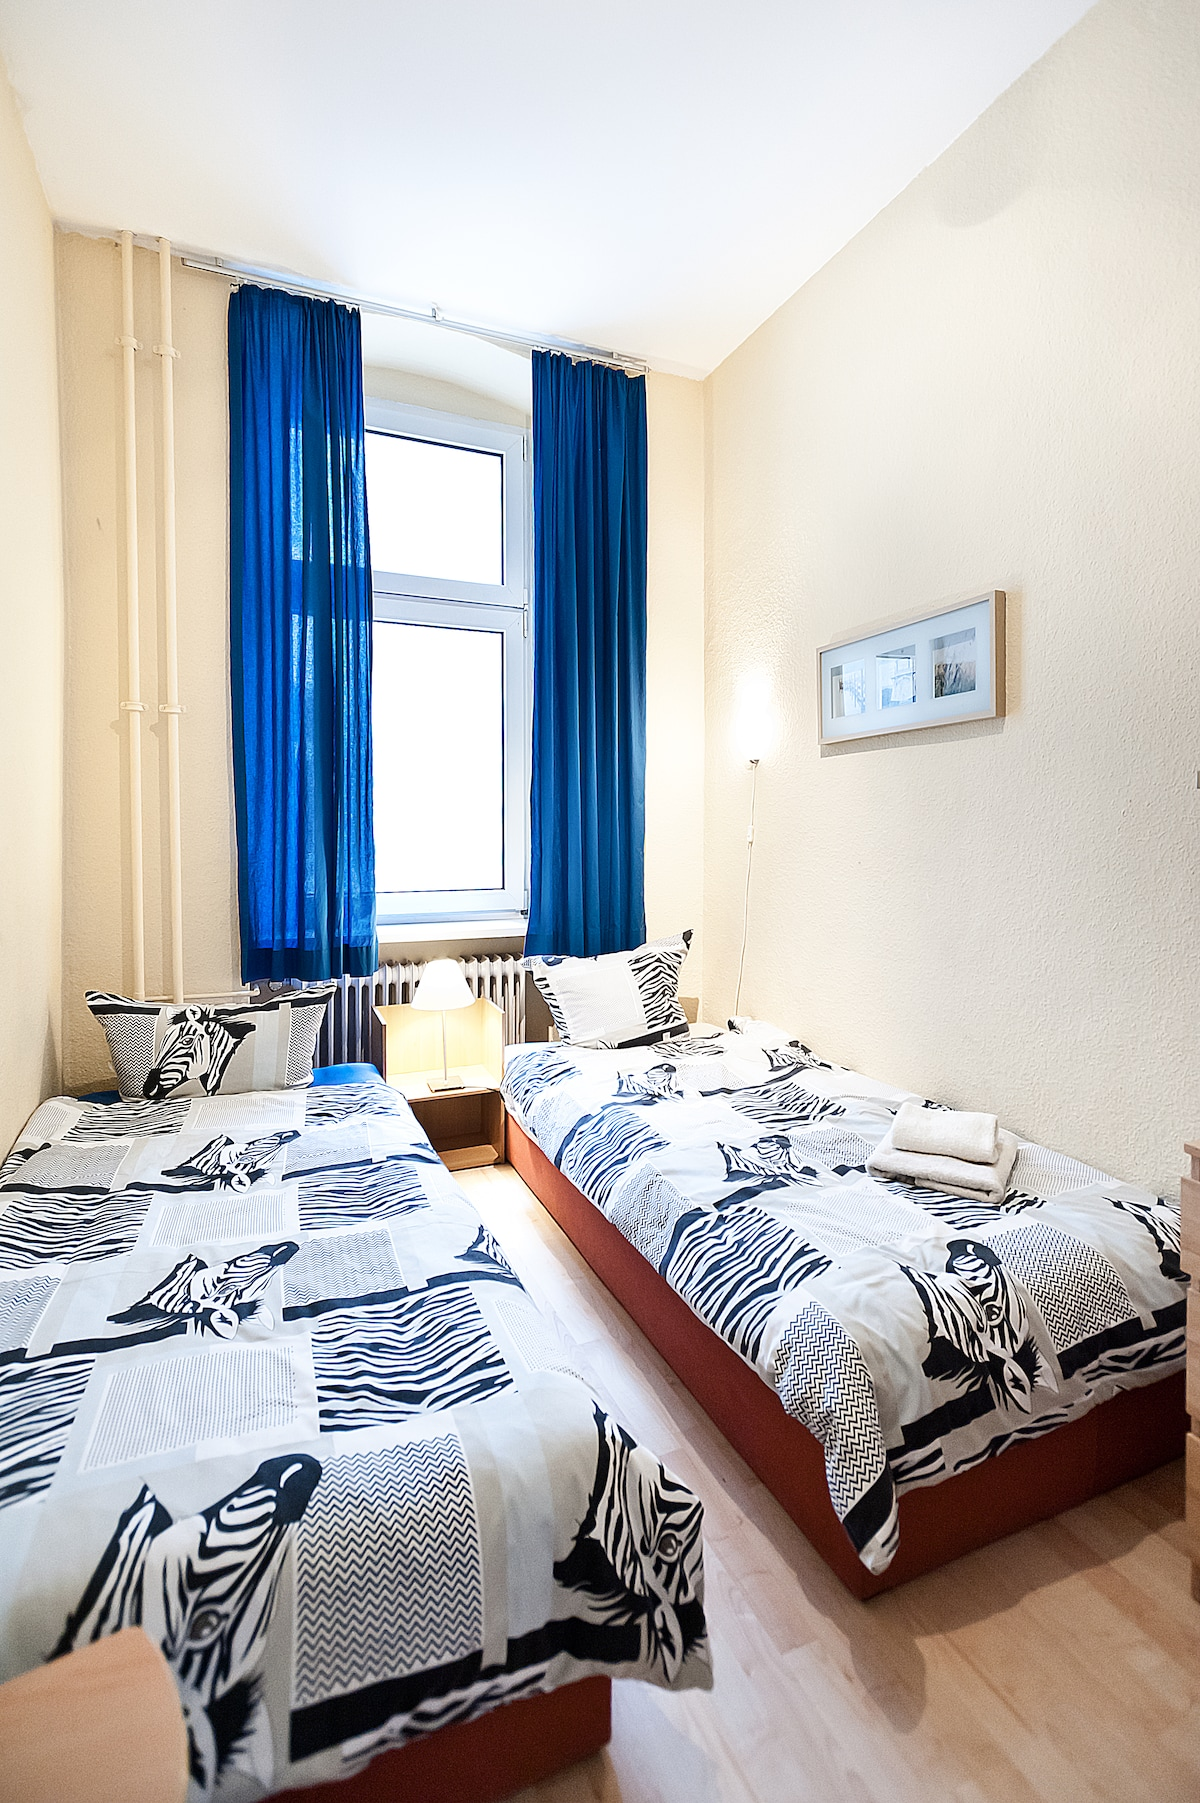 1st bedroom (2 single beds)